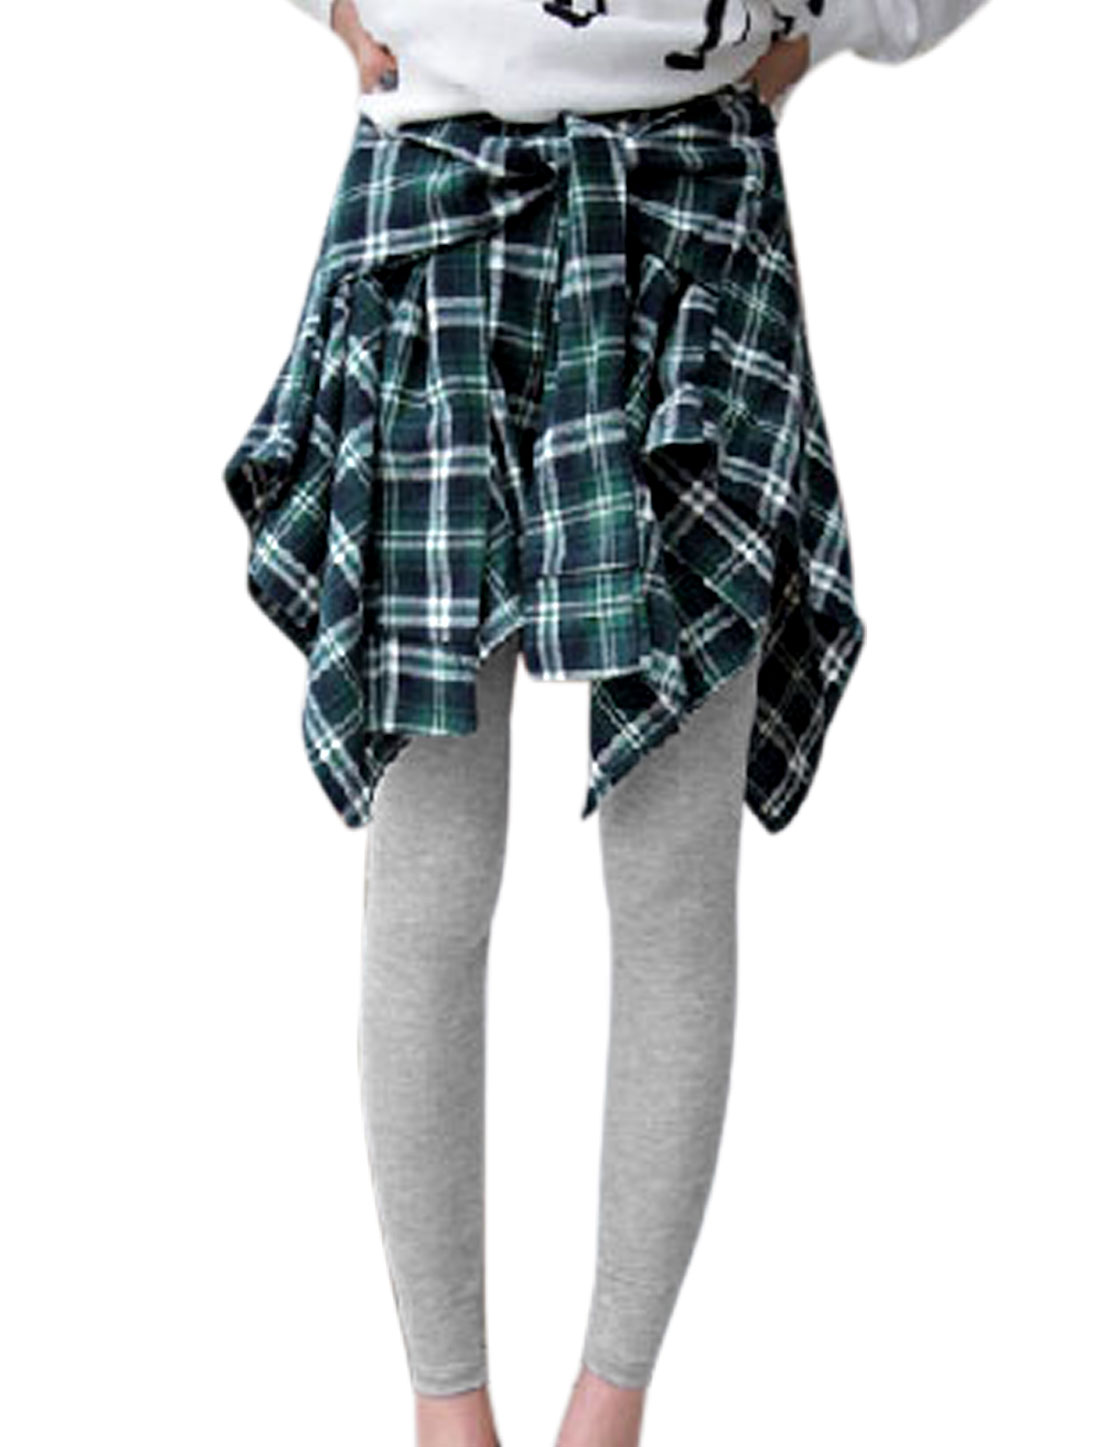 Lady Elastic Waist Zipper Back Layered Design Skorts Pants Green Light Gray XS